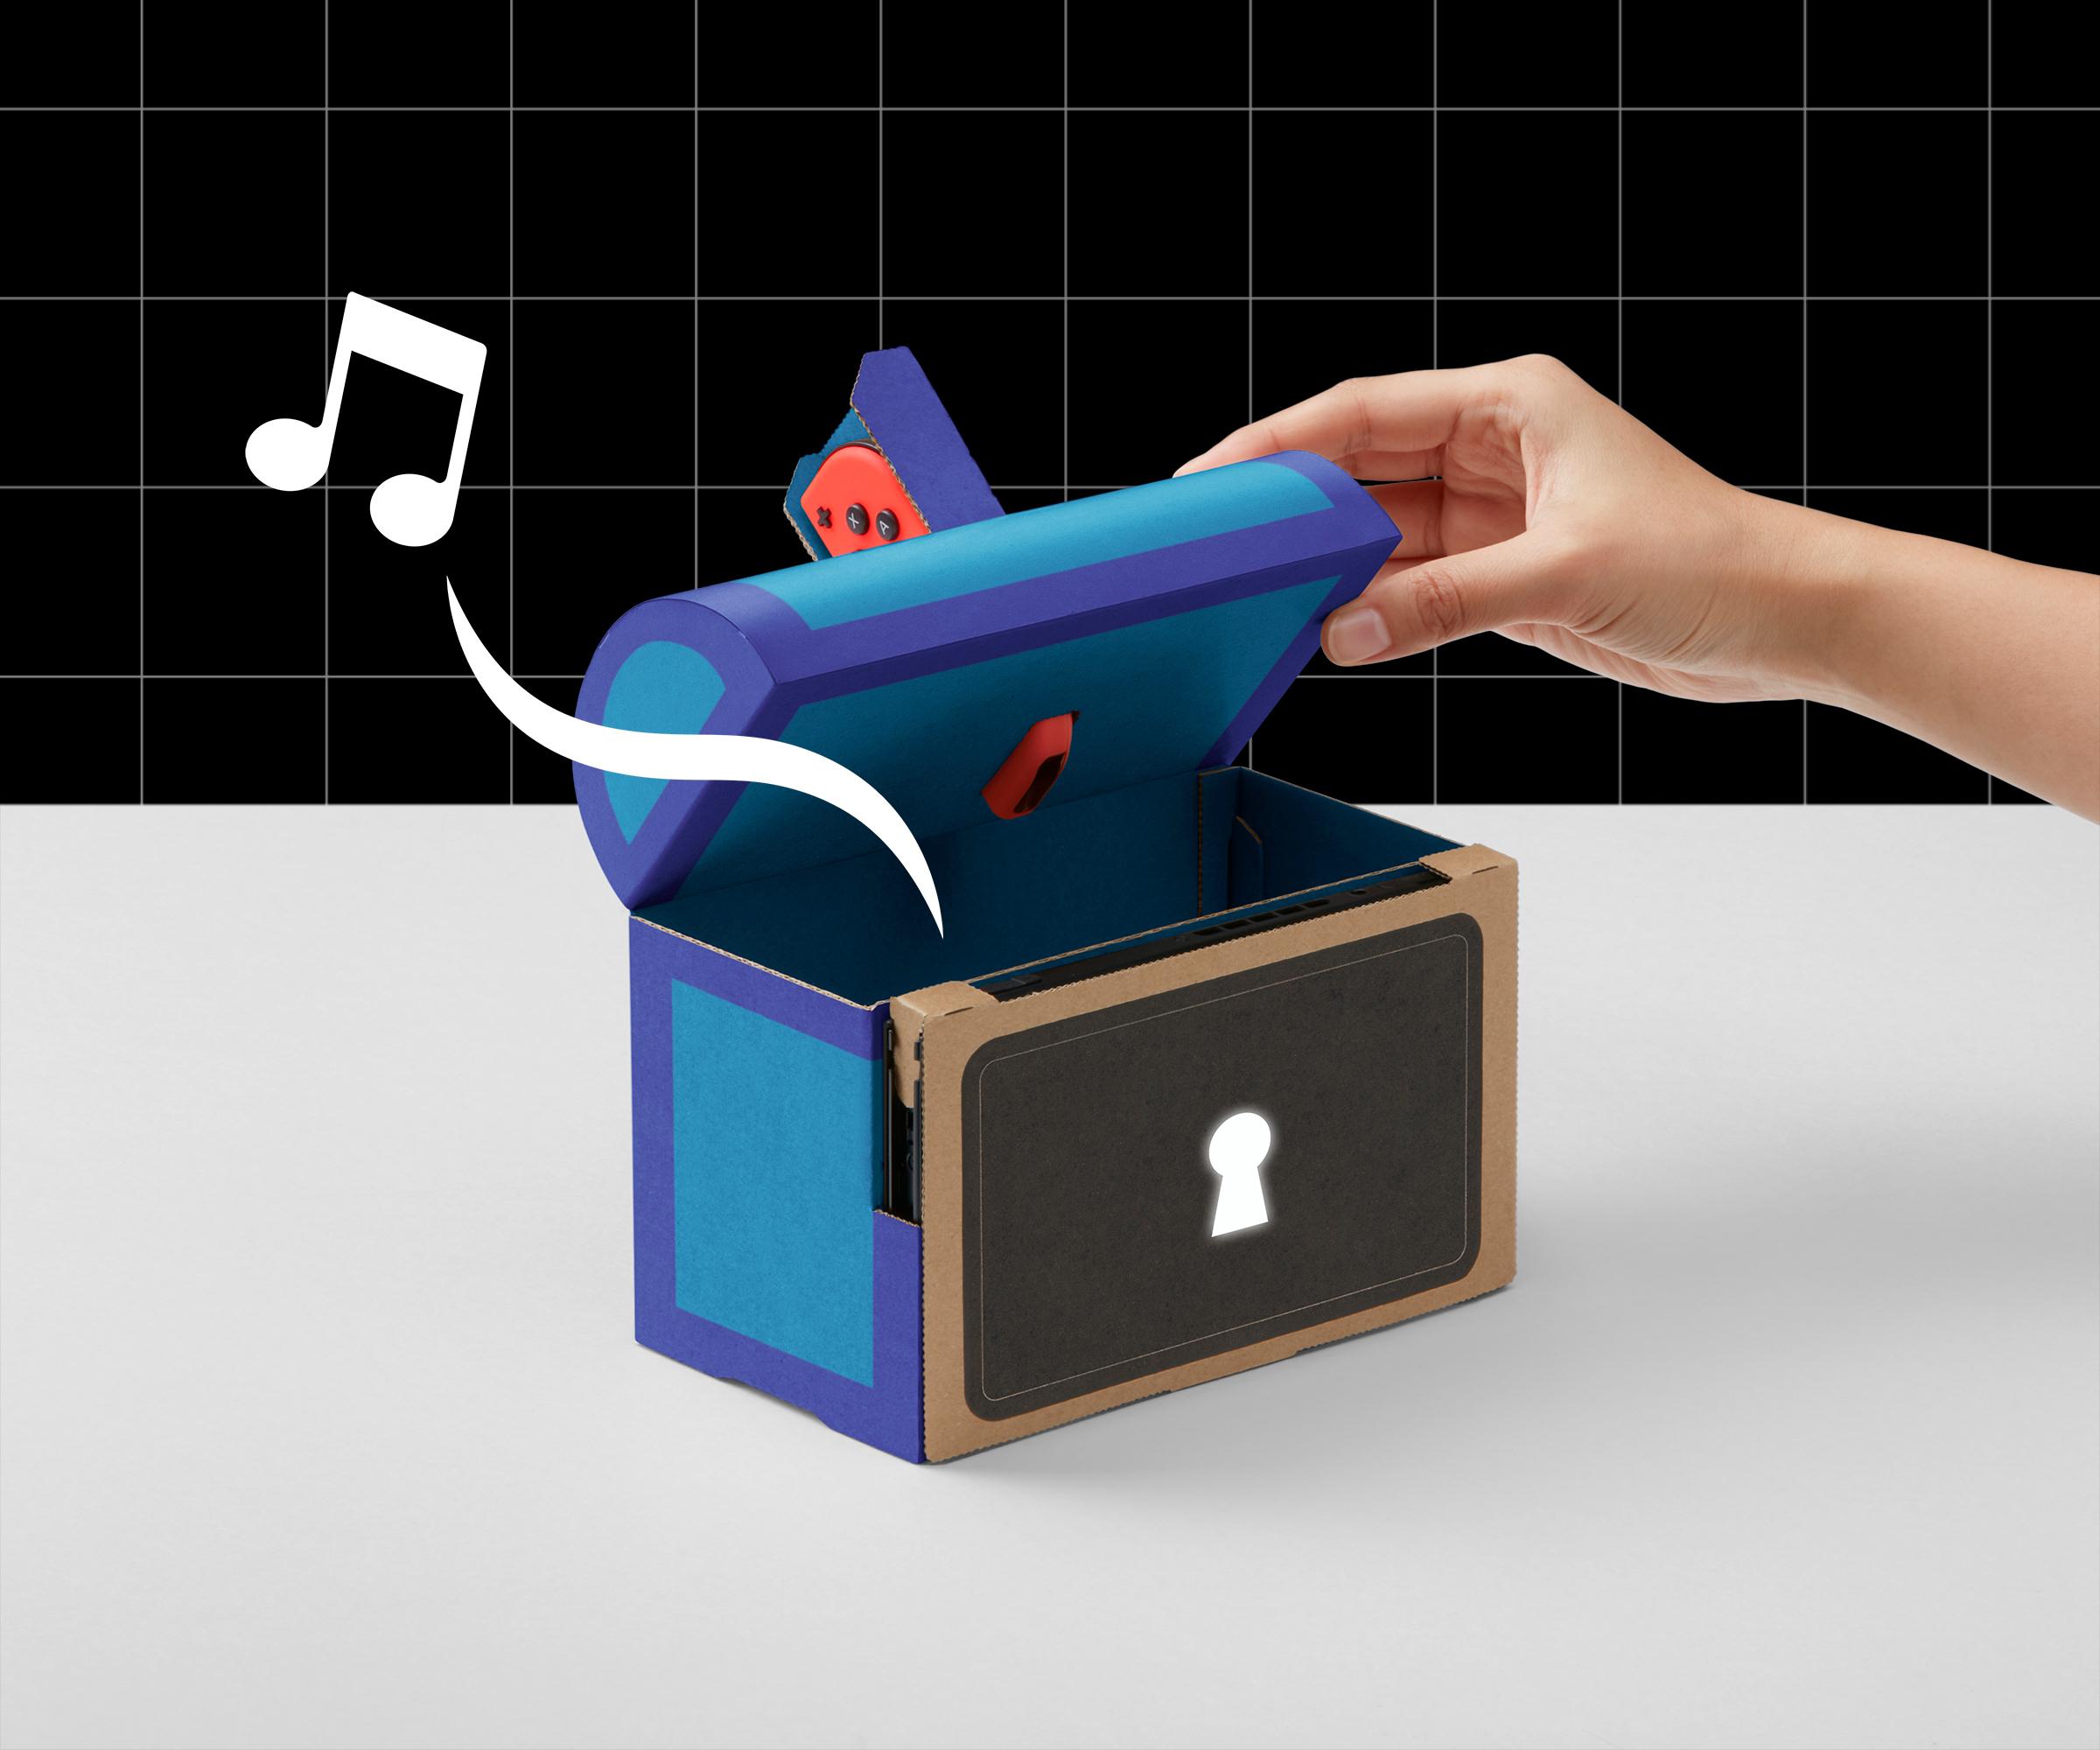 Toy-Con Garage custom project